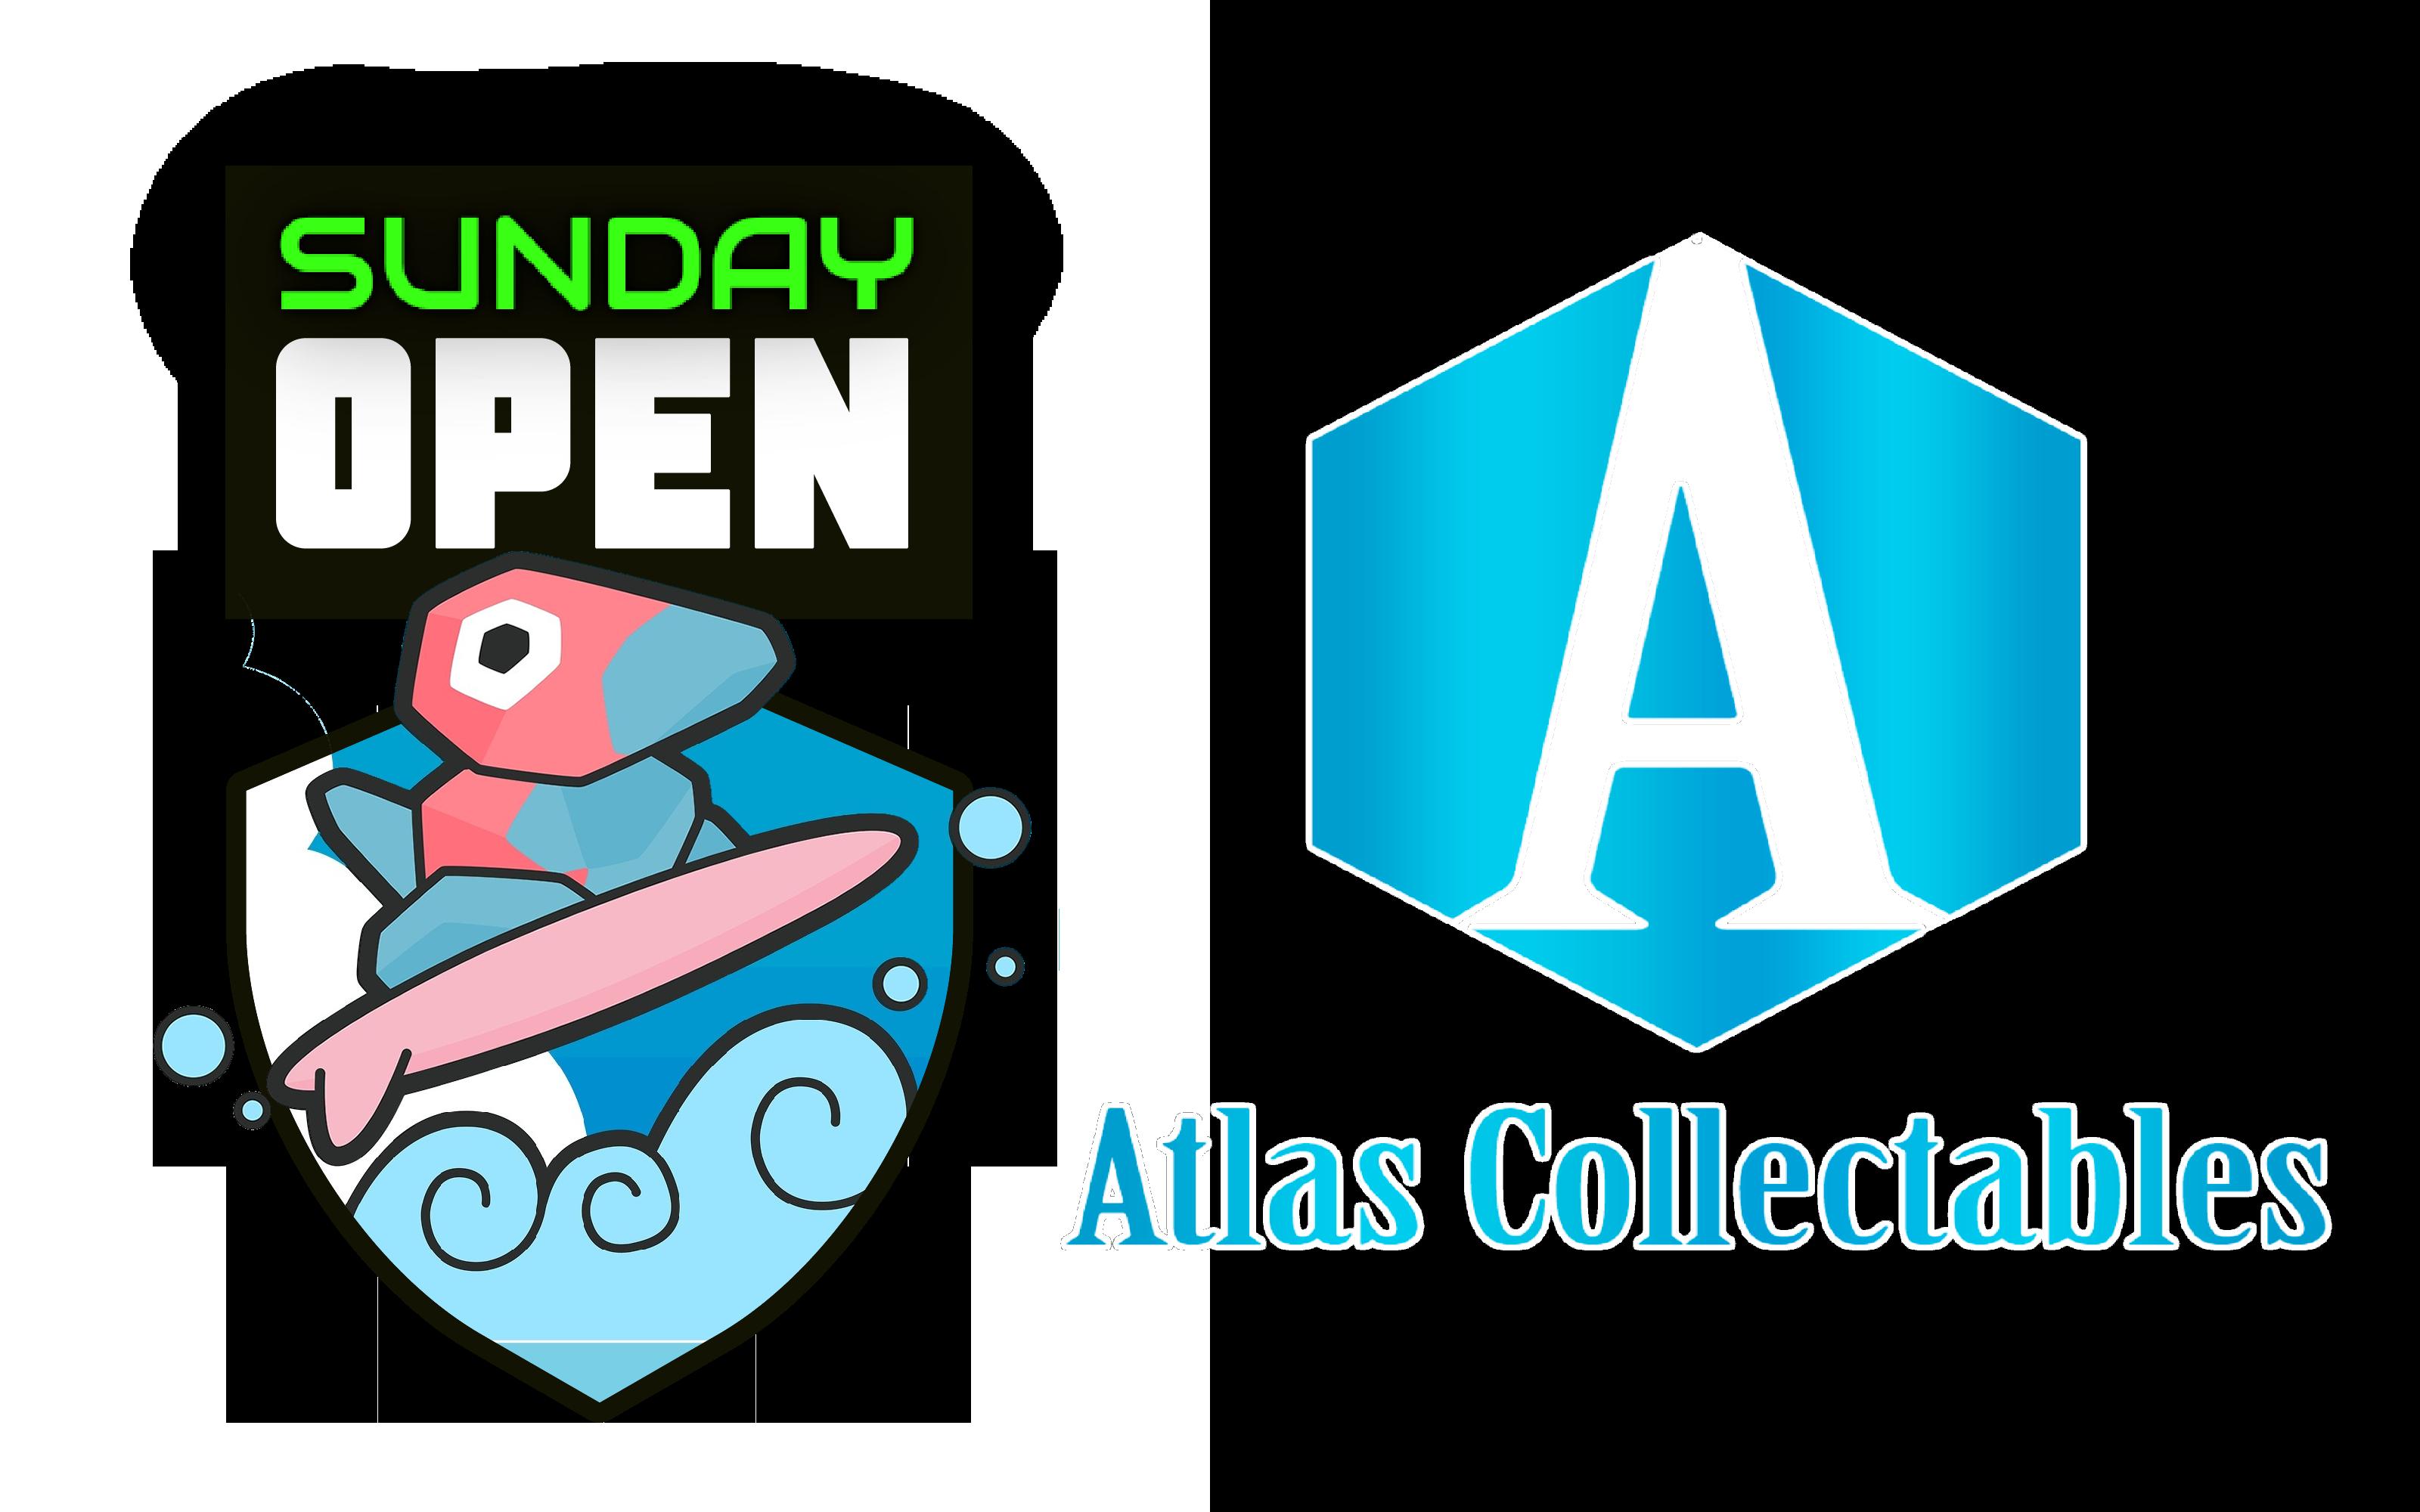 The Sunday Open